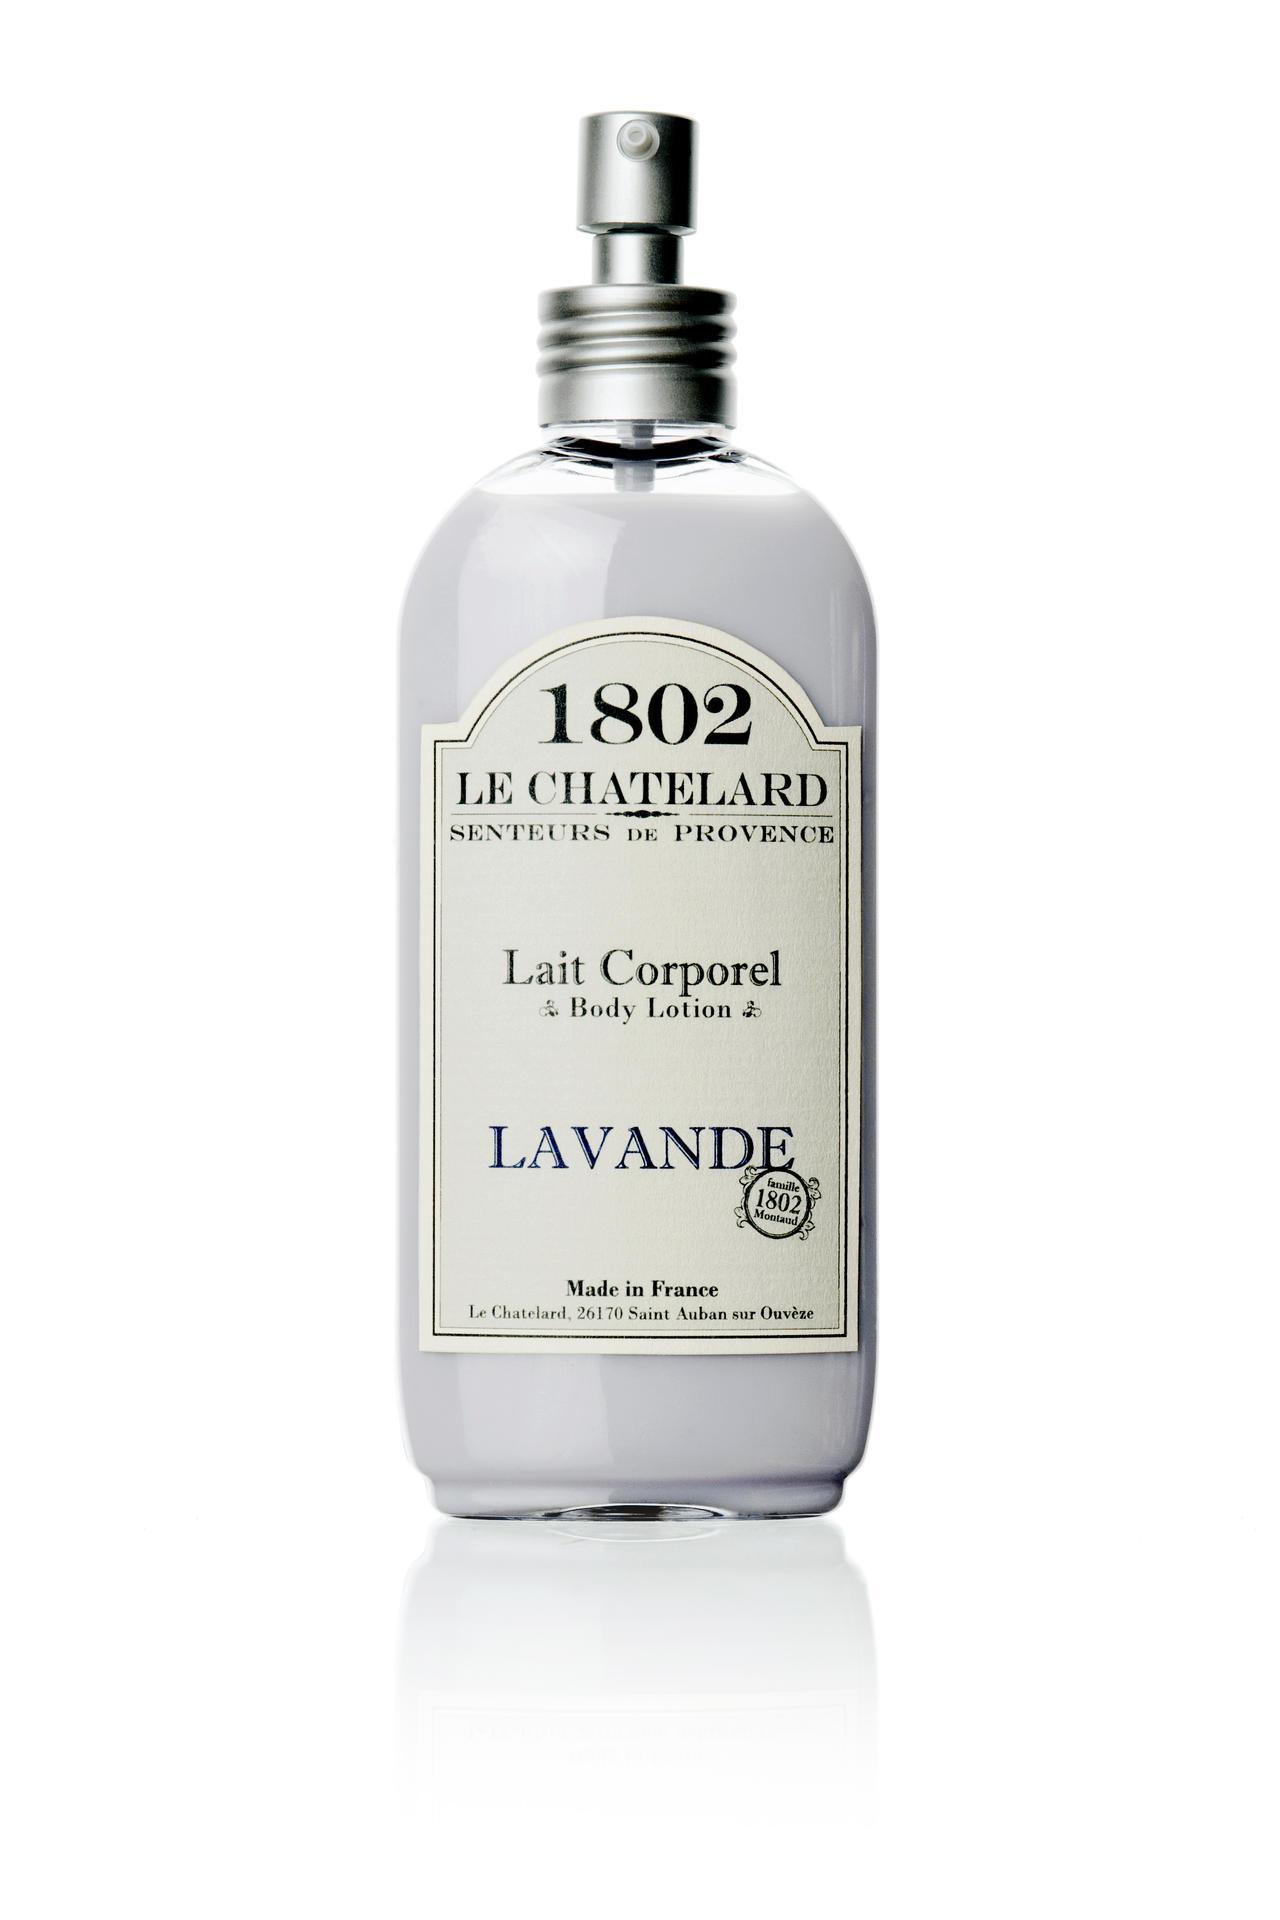 LE CHATELARD Levandulové tělové mléko, bílá barva